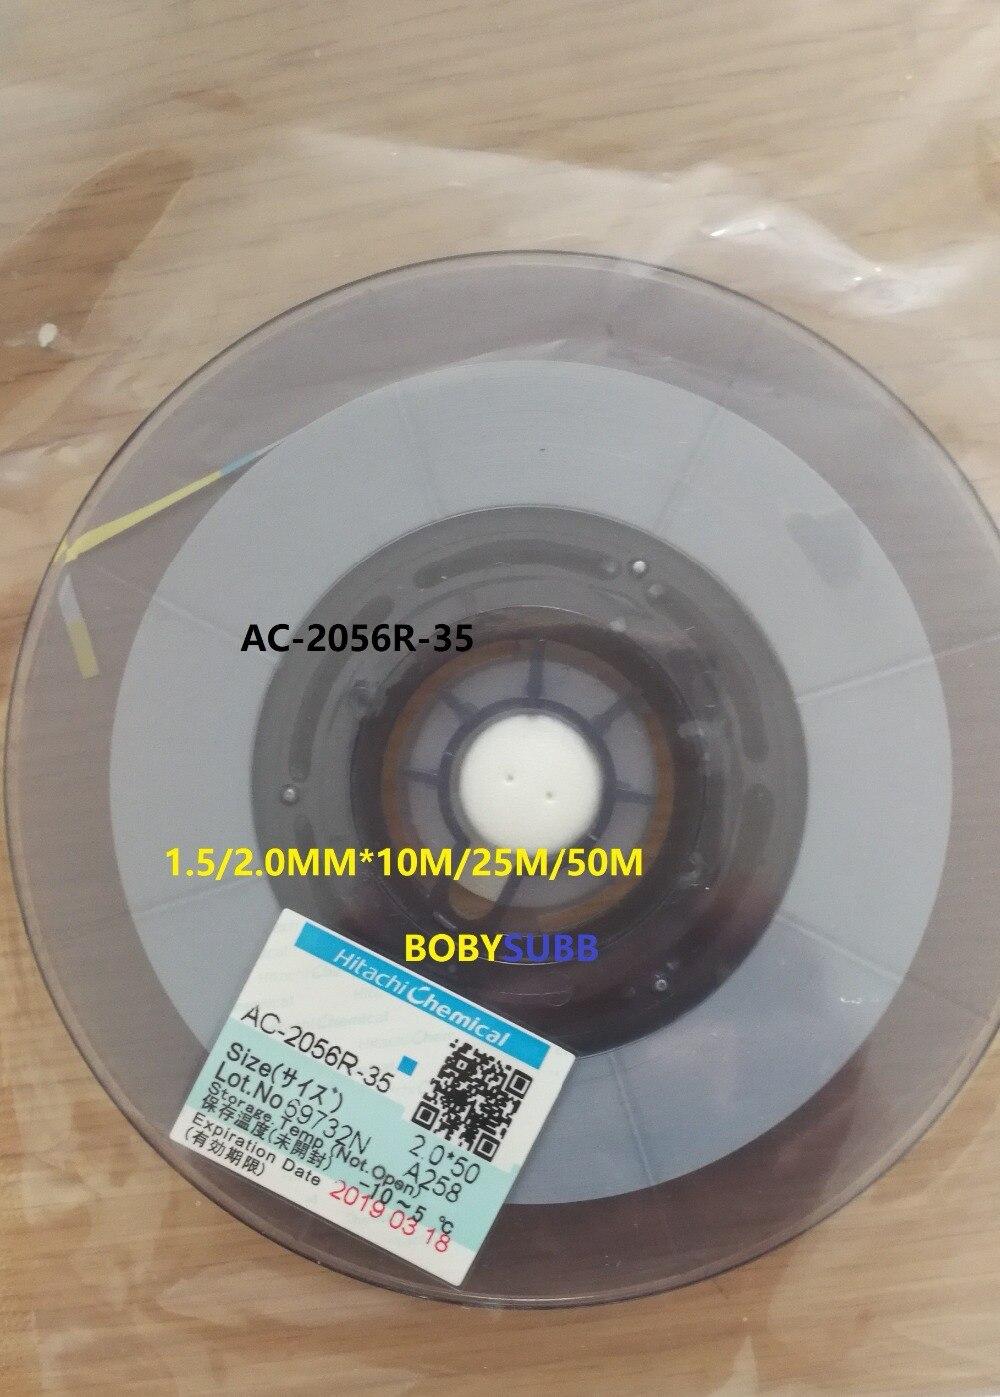 цены New Date Original ACF AC-2056R-35 AC2056R-35 PCB Repair TAPE 1.5/2.0MM*10M/25M/50M